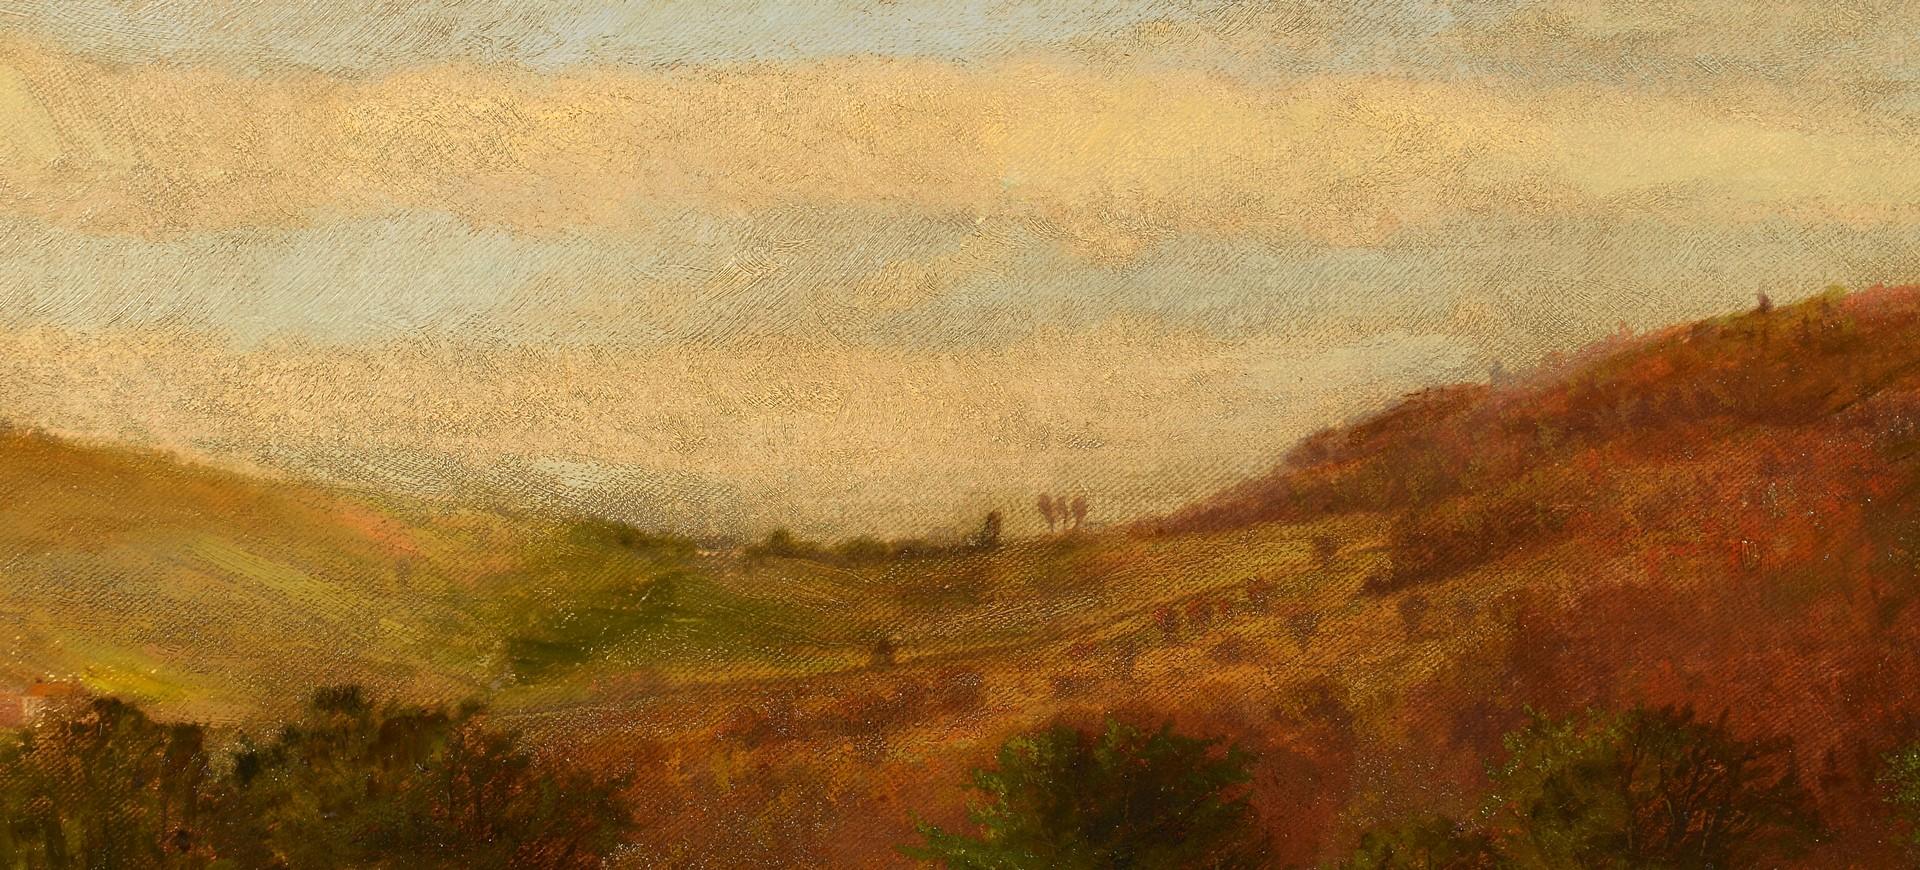 Lot 490: Frank Shapleigh Oil on Canvas Landscape, poss. TN